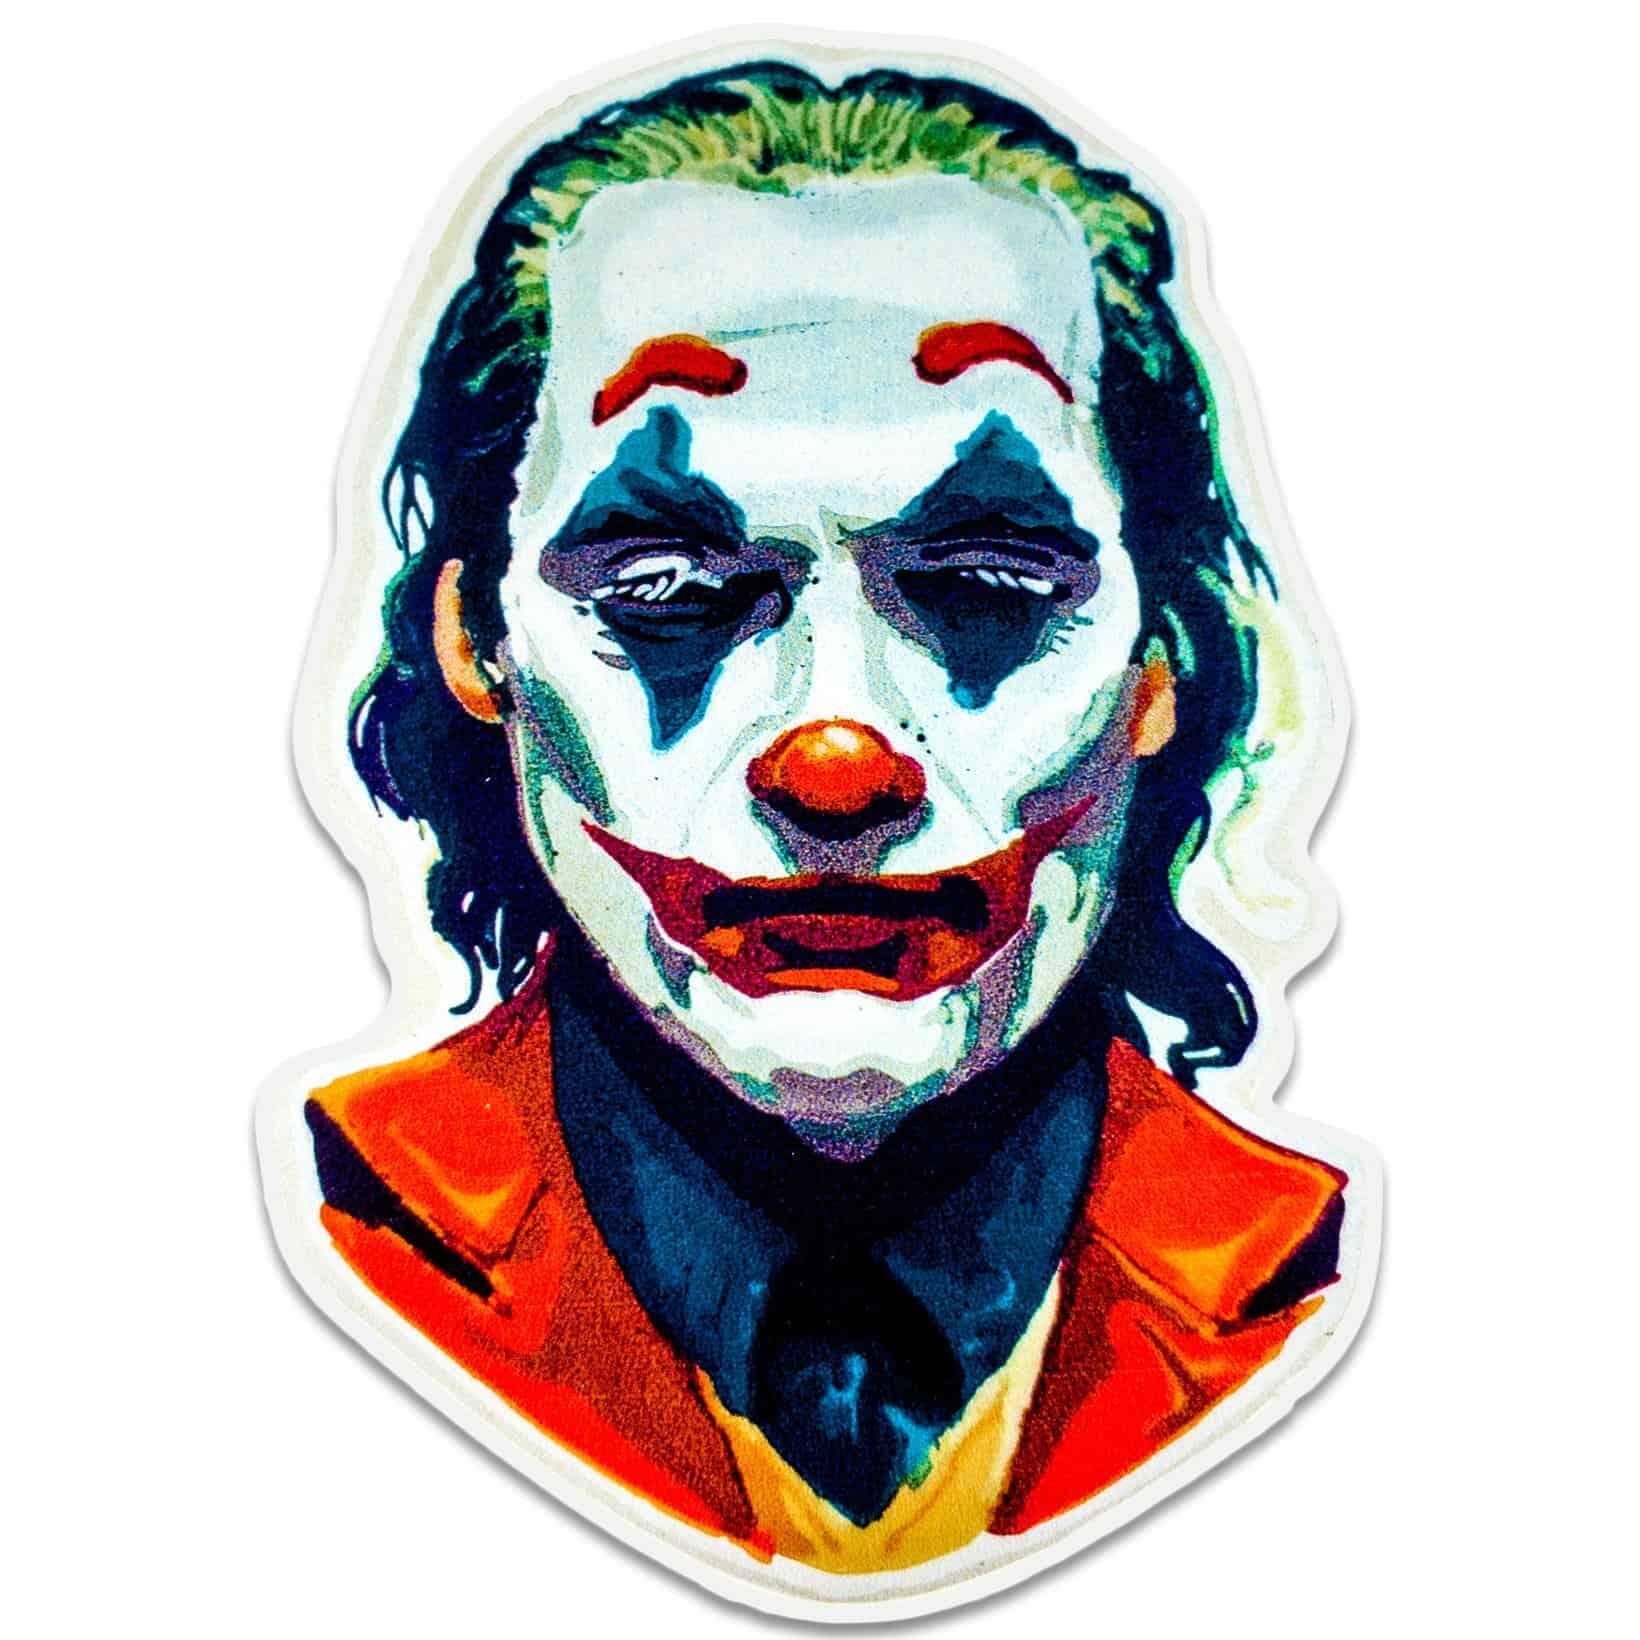 Joaquin Phoenix From Joker